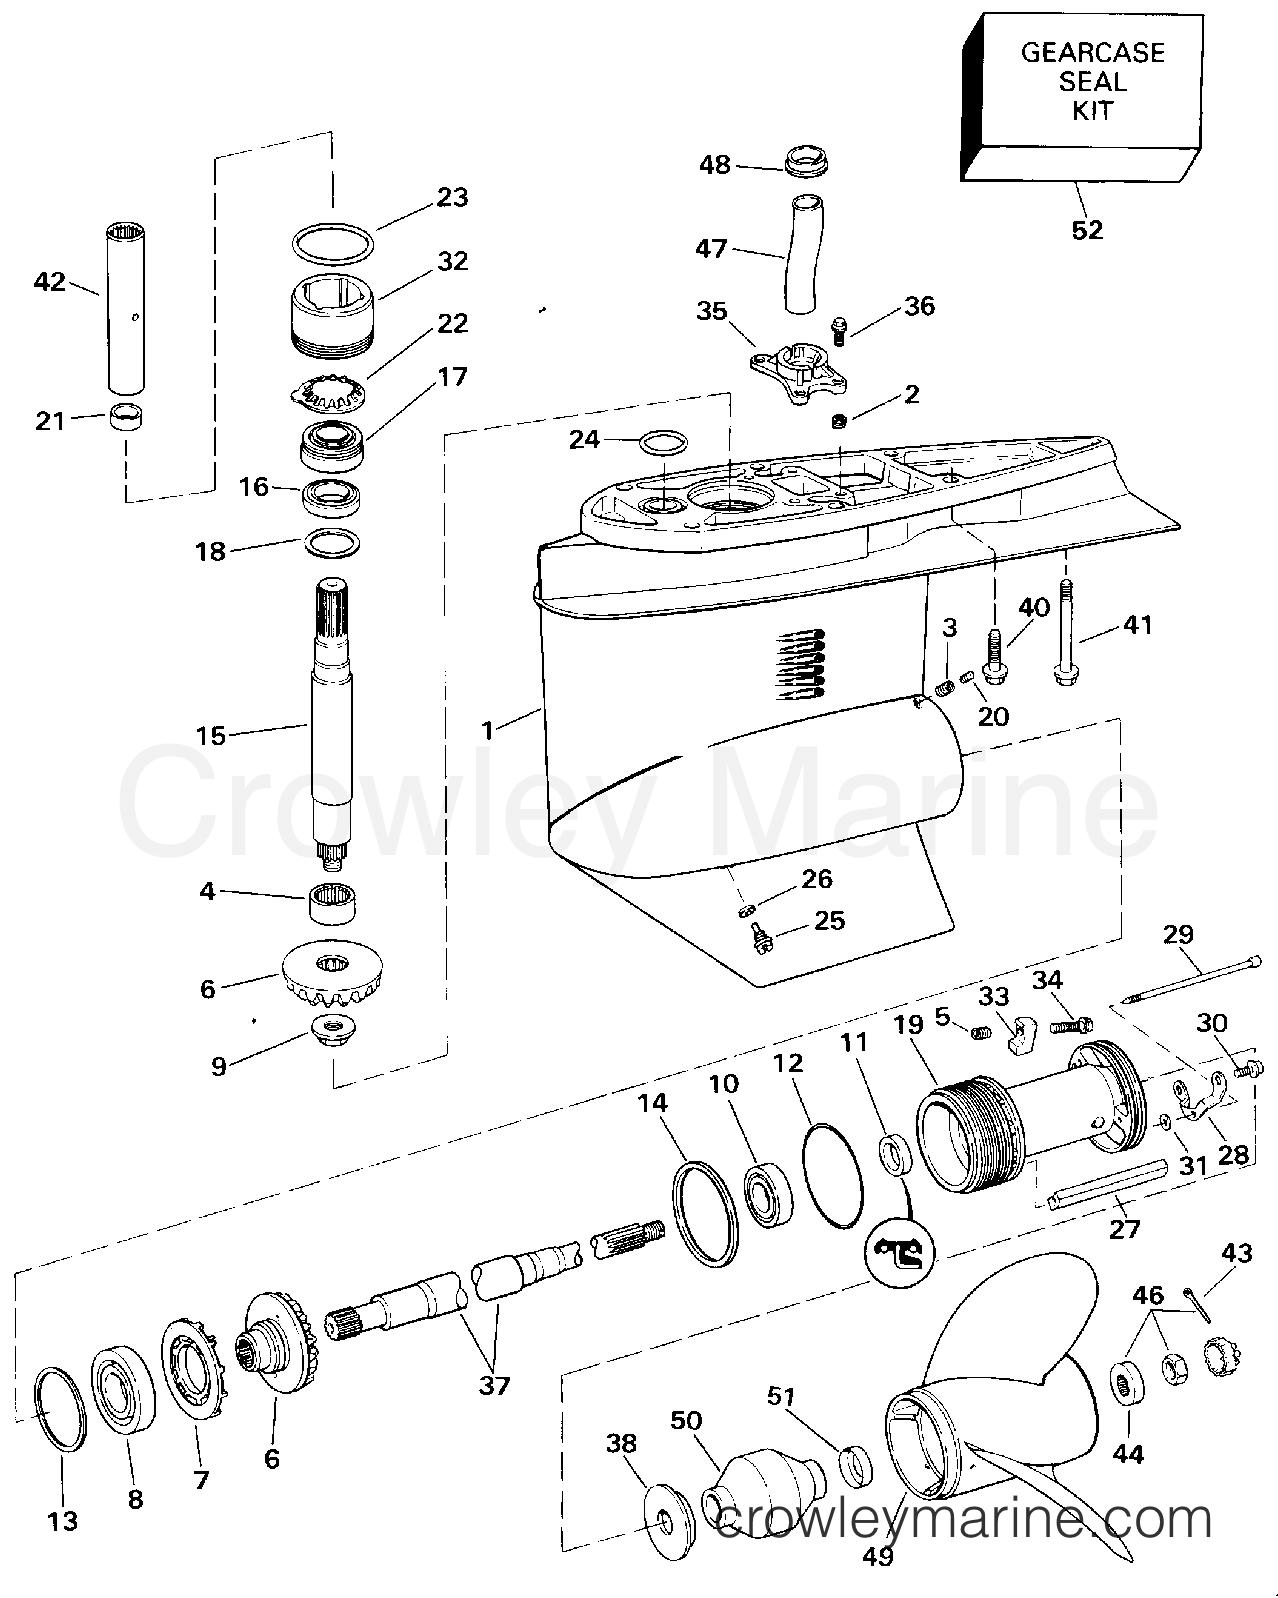 1994 OMC Stern Drive 5.8 - 58FBDPMDA - LOWER GEARCASE